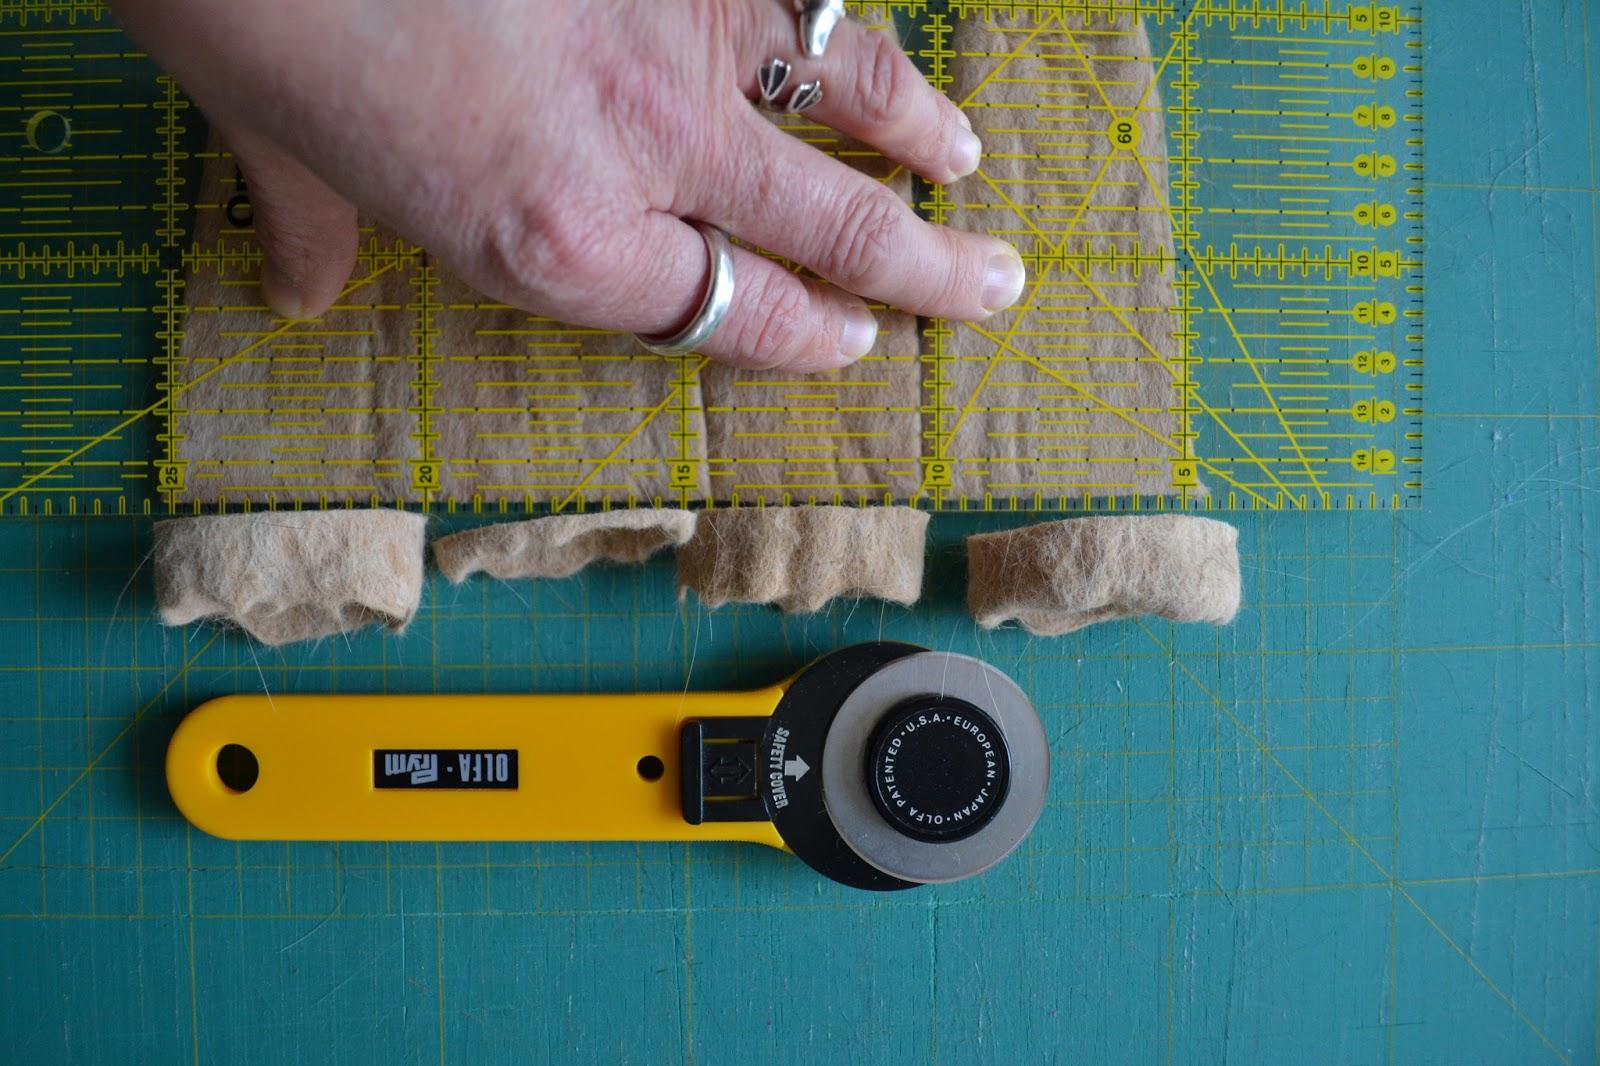 filzen mit tierhaaren 6 katzenhaar filzgleiter f r st hle. Black Bedroom Furniture Sets. Home Design Ideas